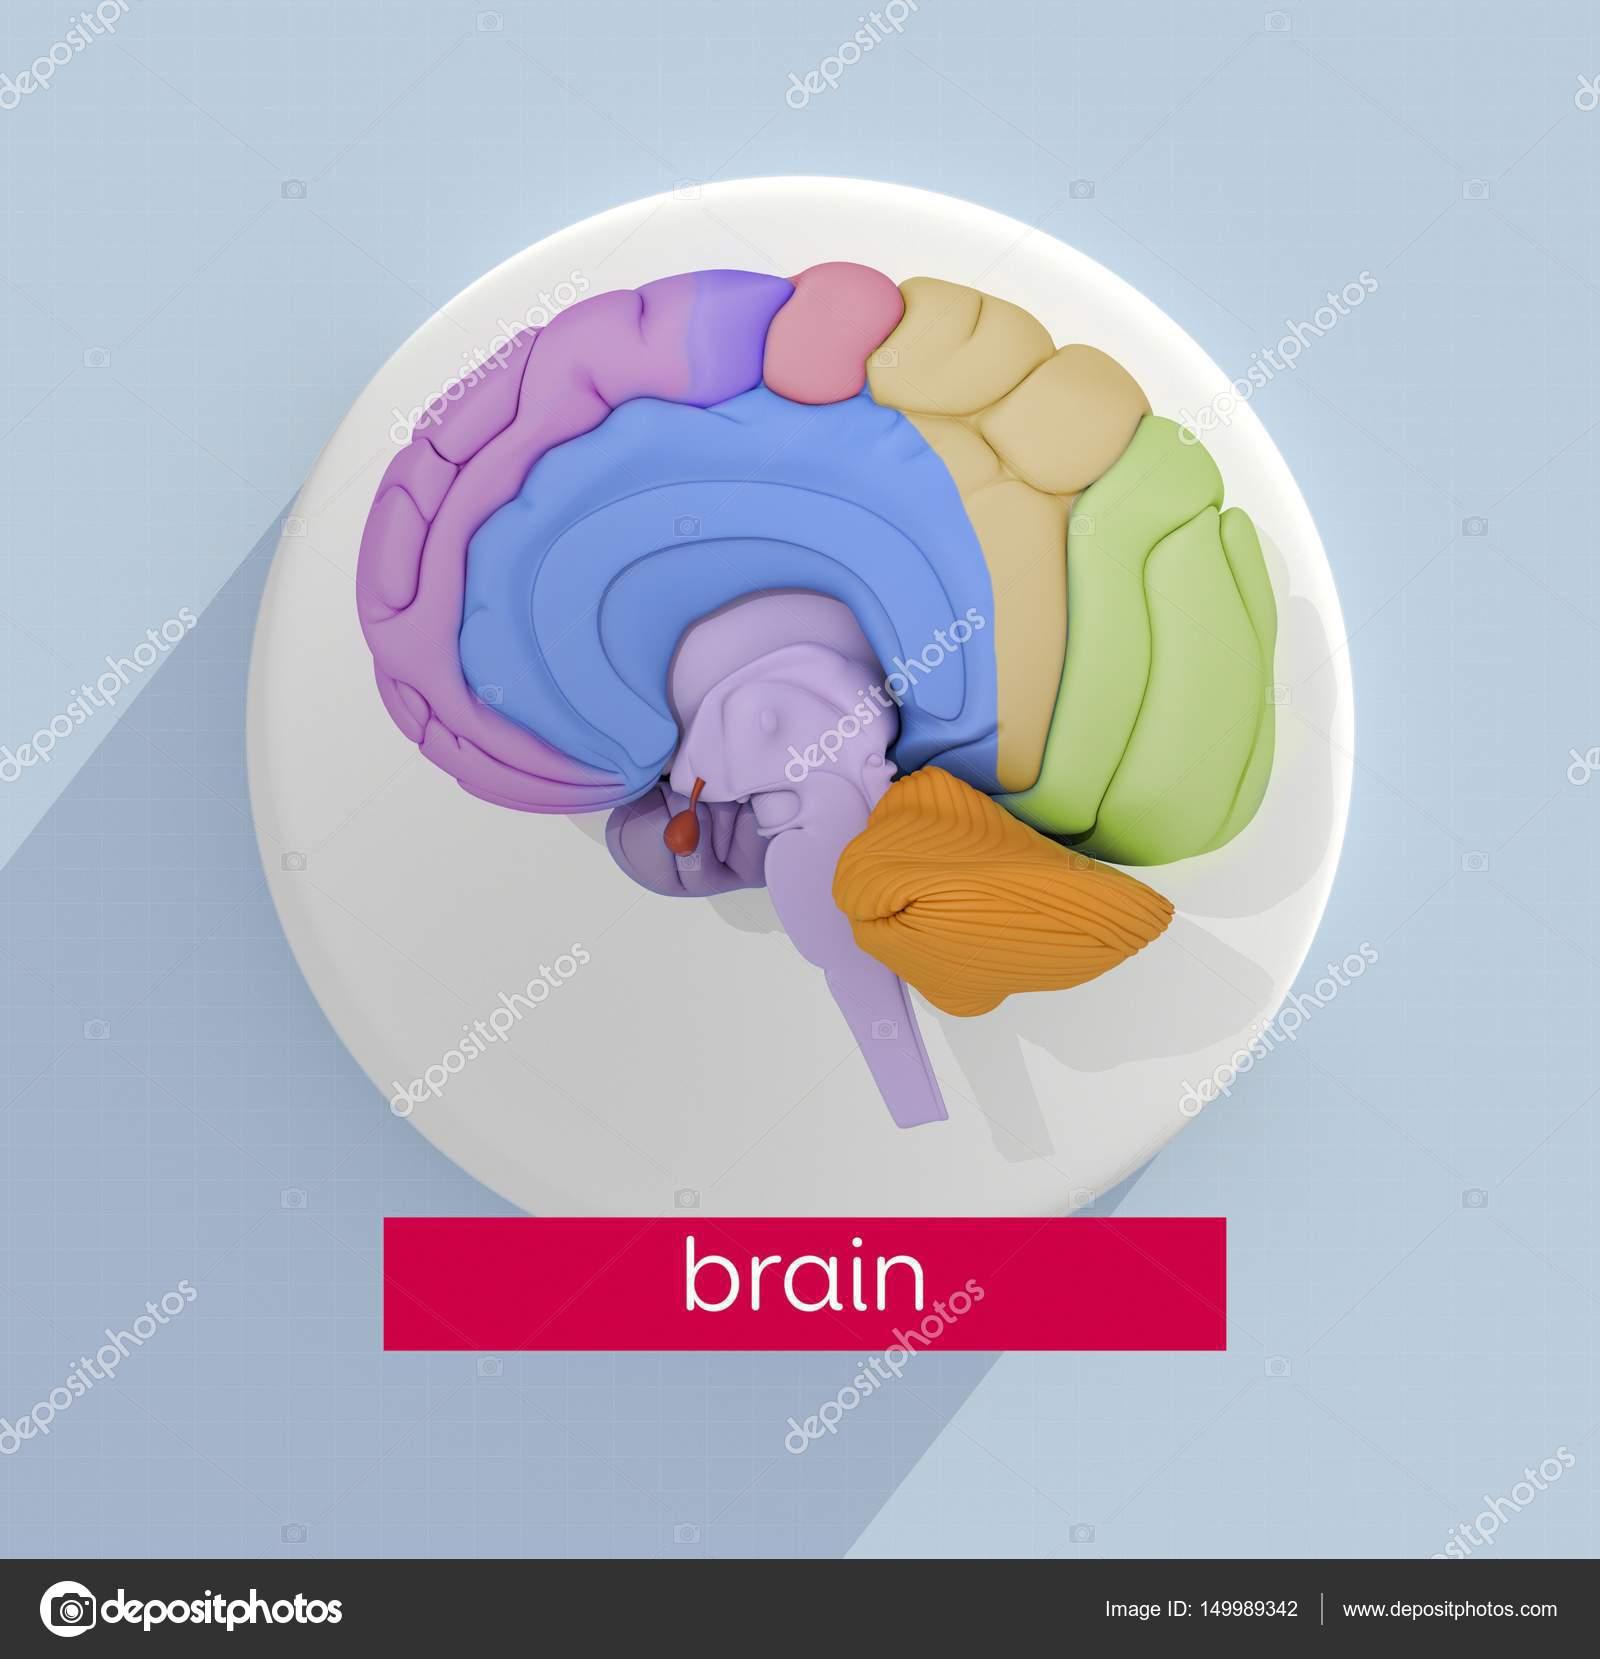 Human brain anatomy model icon — Stock Photo © AnatomyInsider #149989342